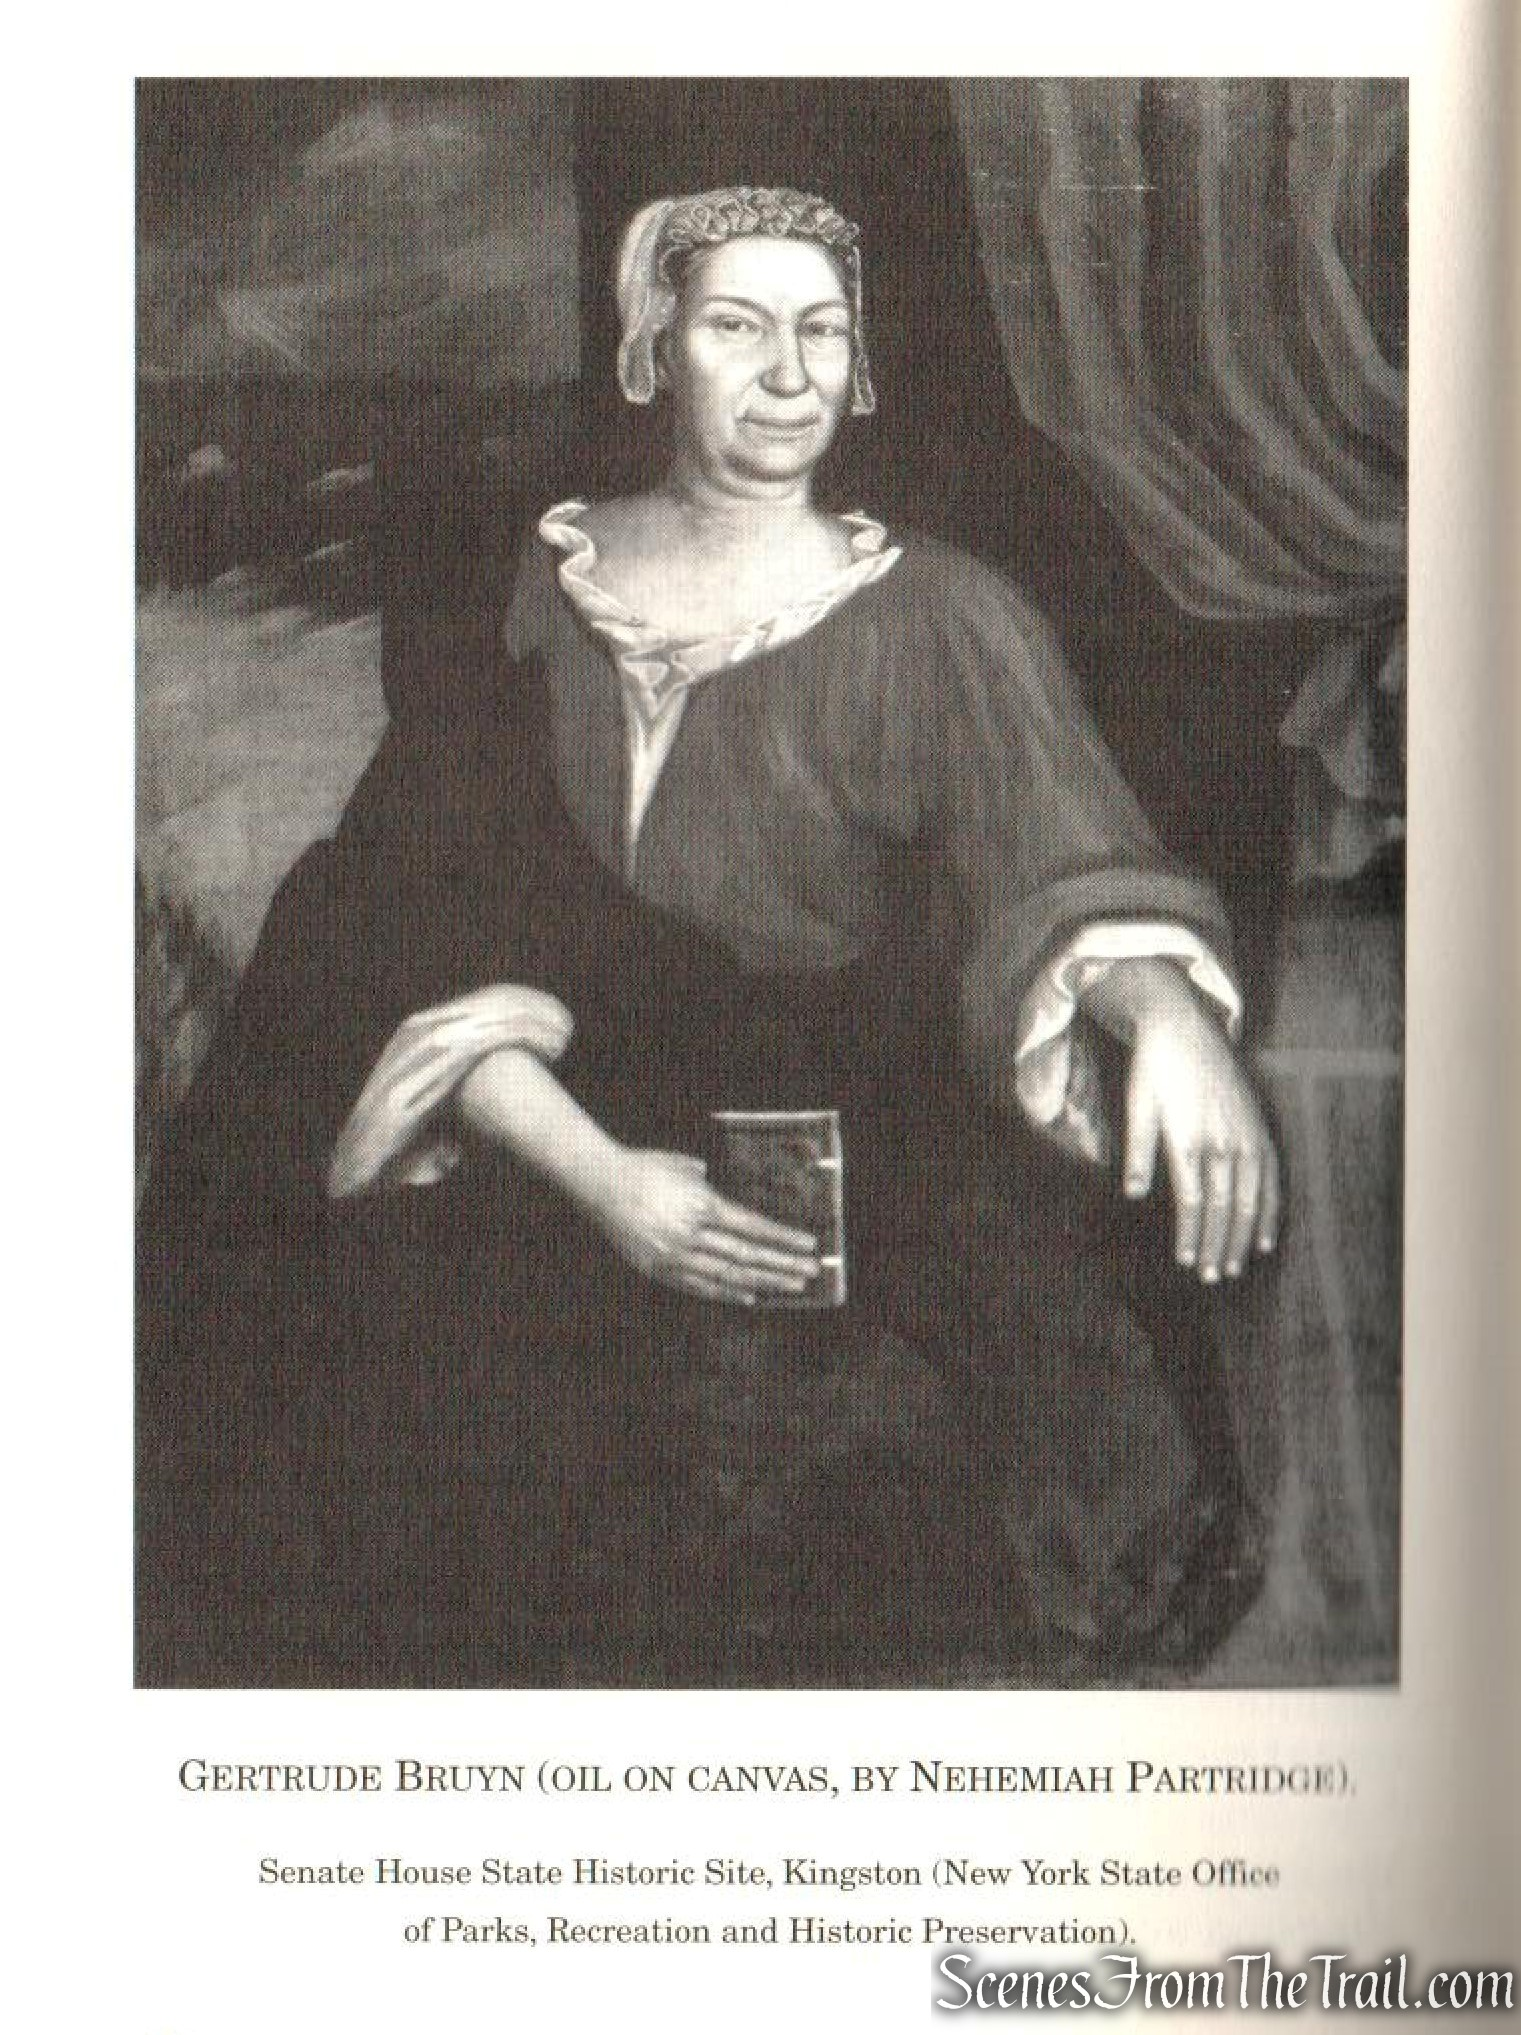 Gertrude Bruyn